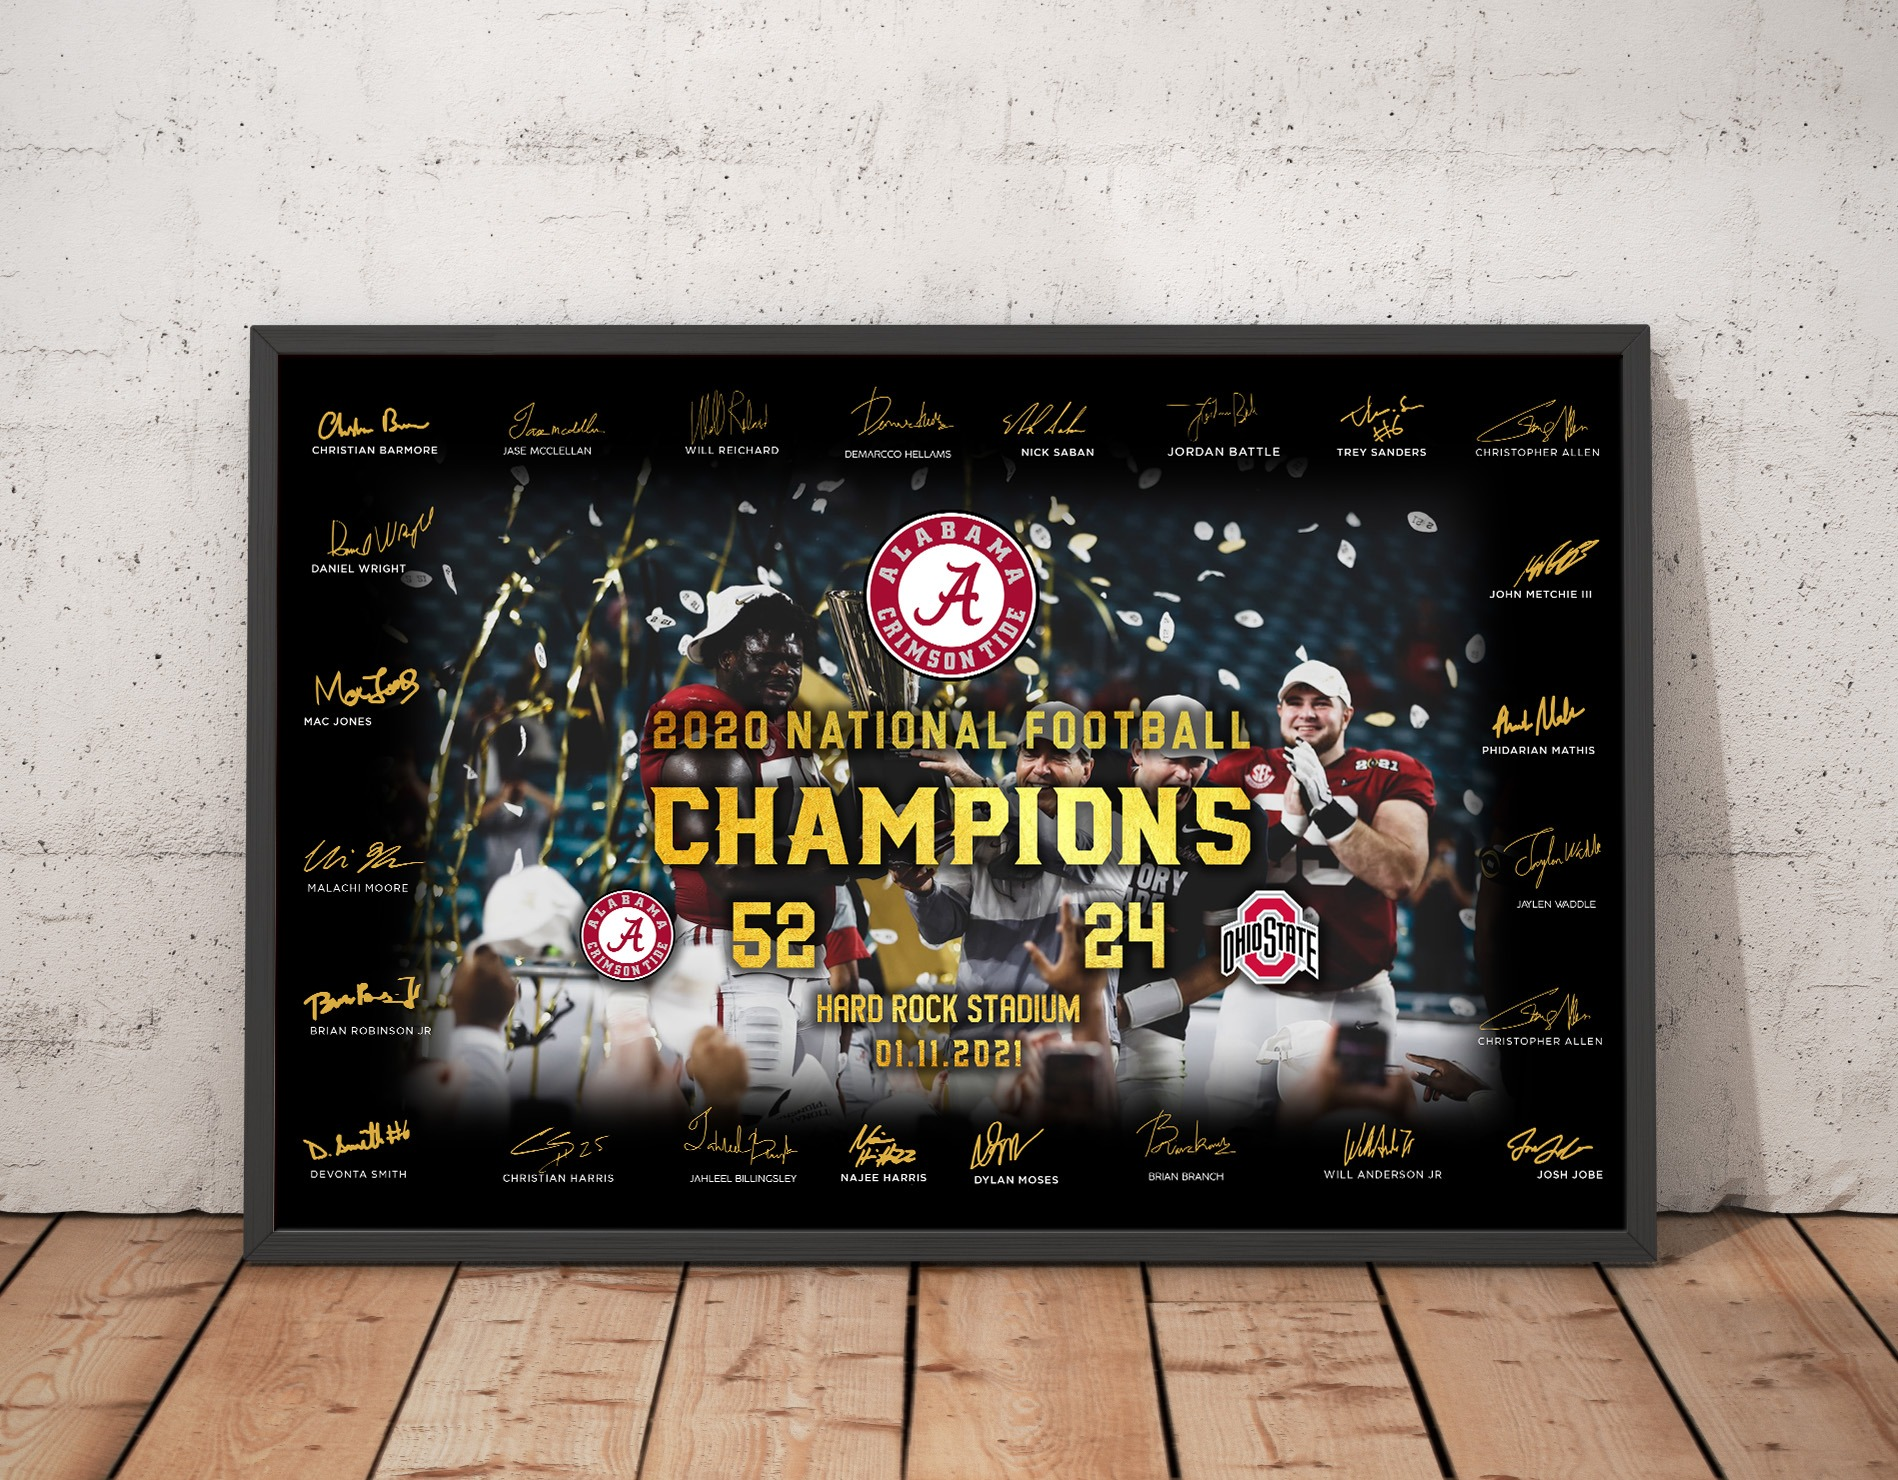 Alabama Crimson 2020 National Football Champion Player Signatures Poster 1